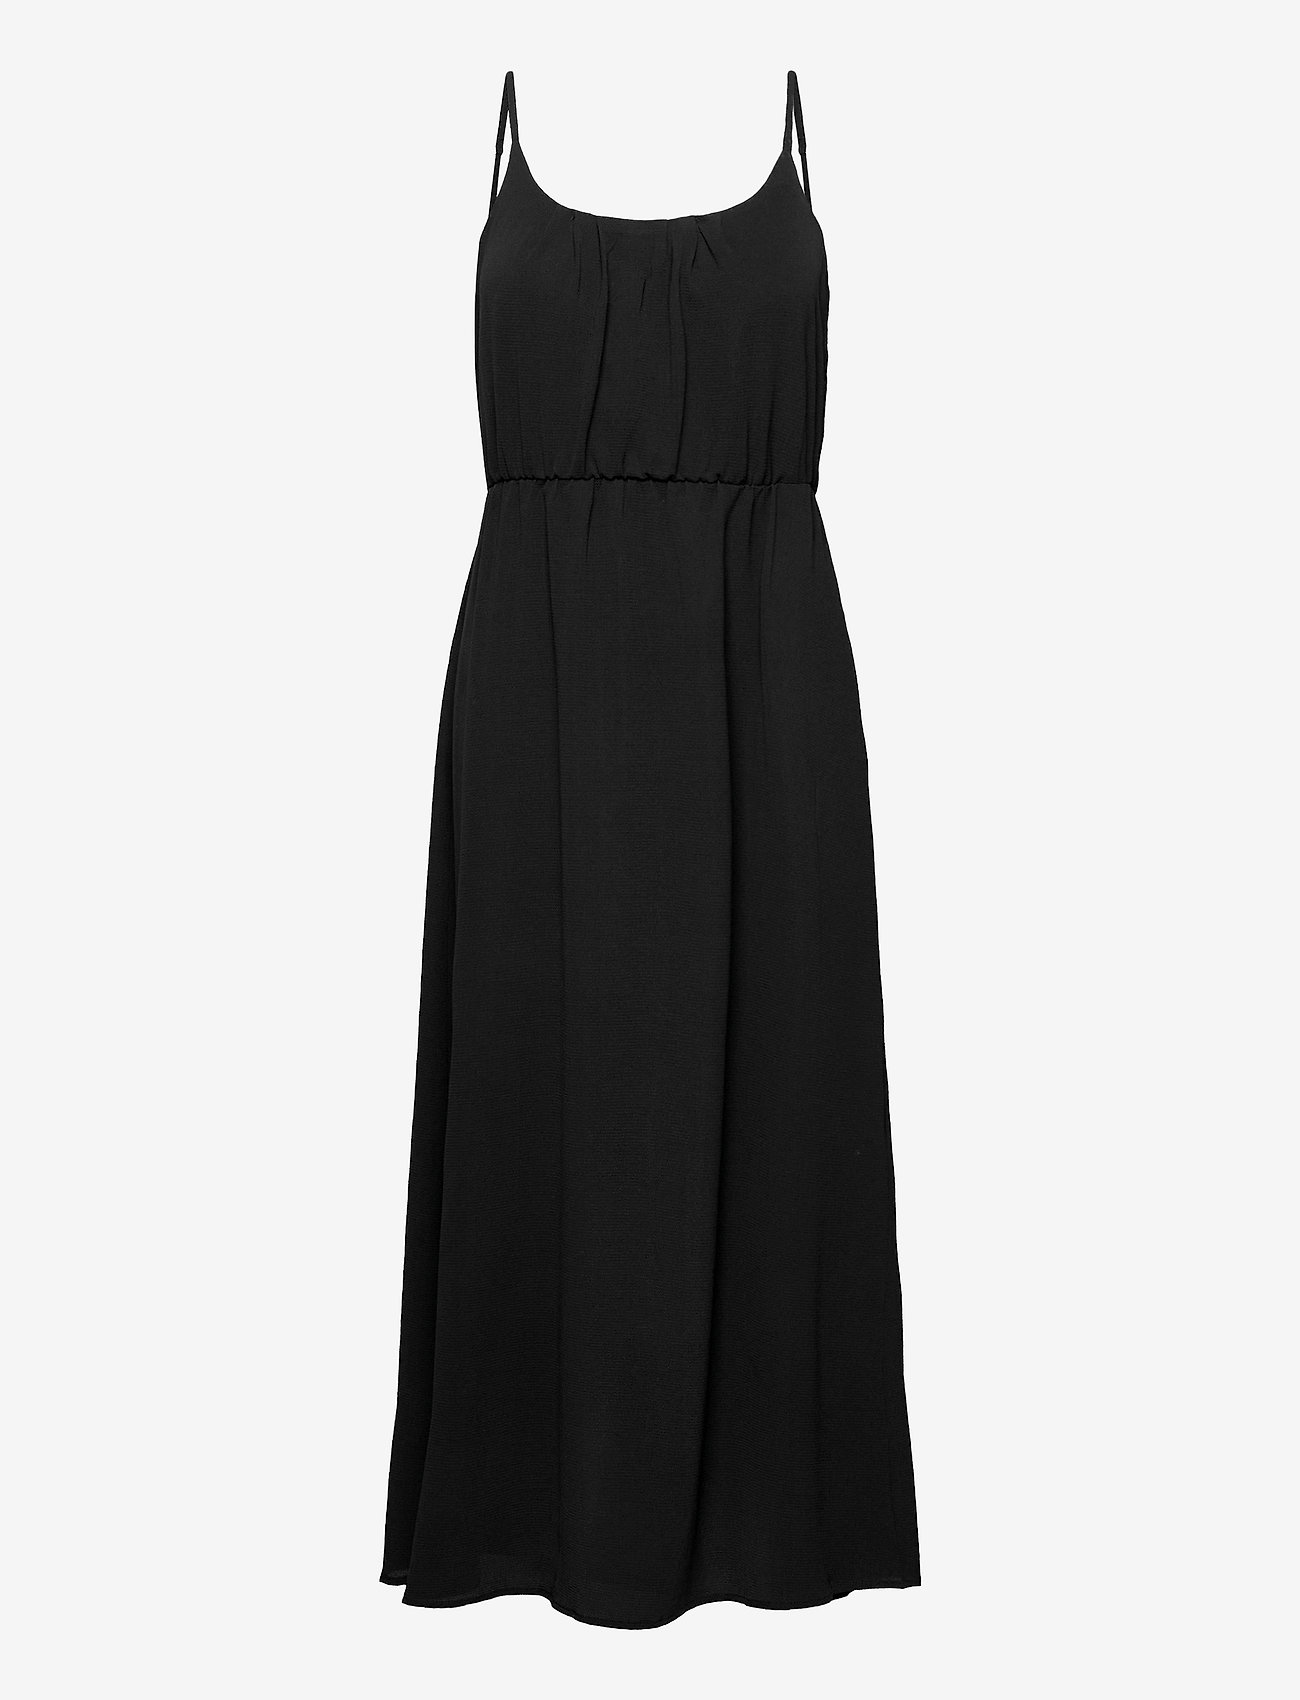 Vero Moda - VMSASHA MAXI DRESS GA - sommarklänningar - black - 0